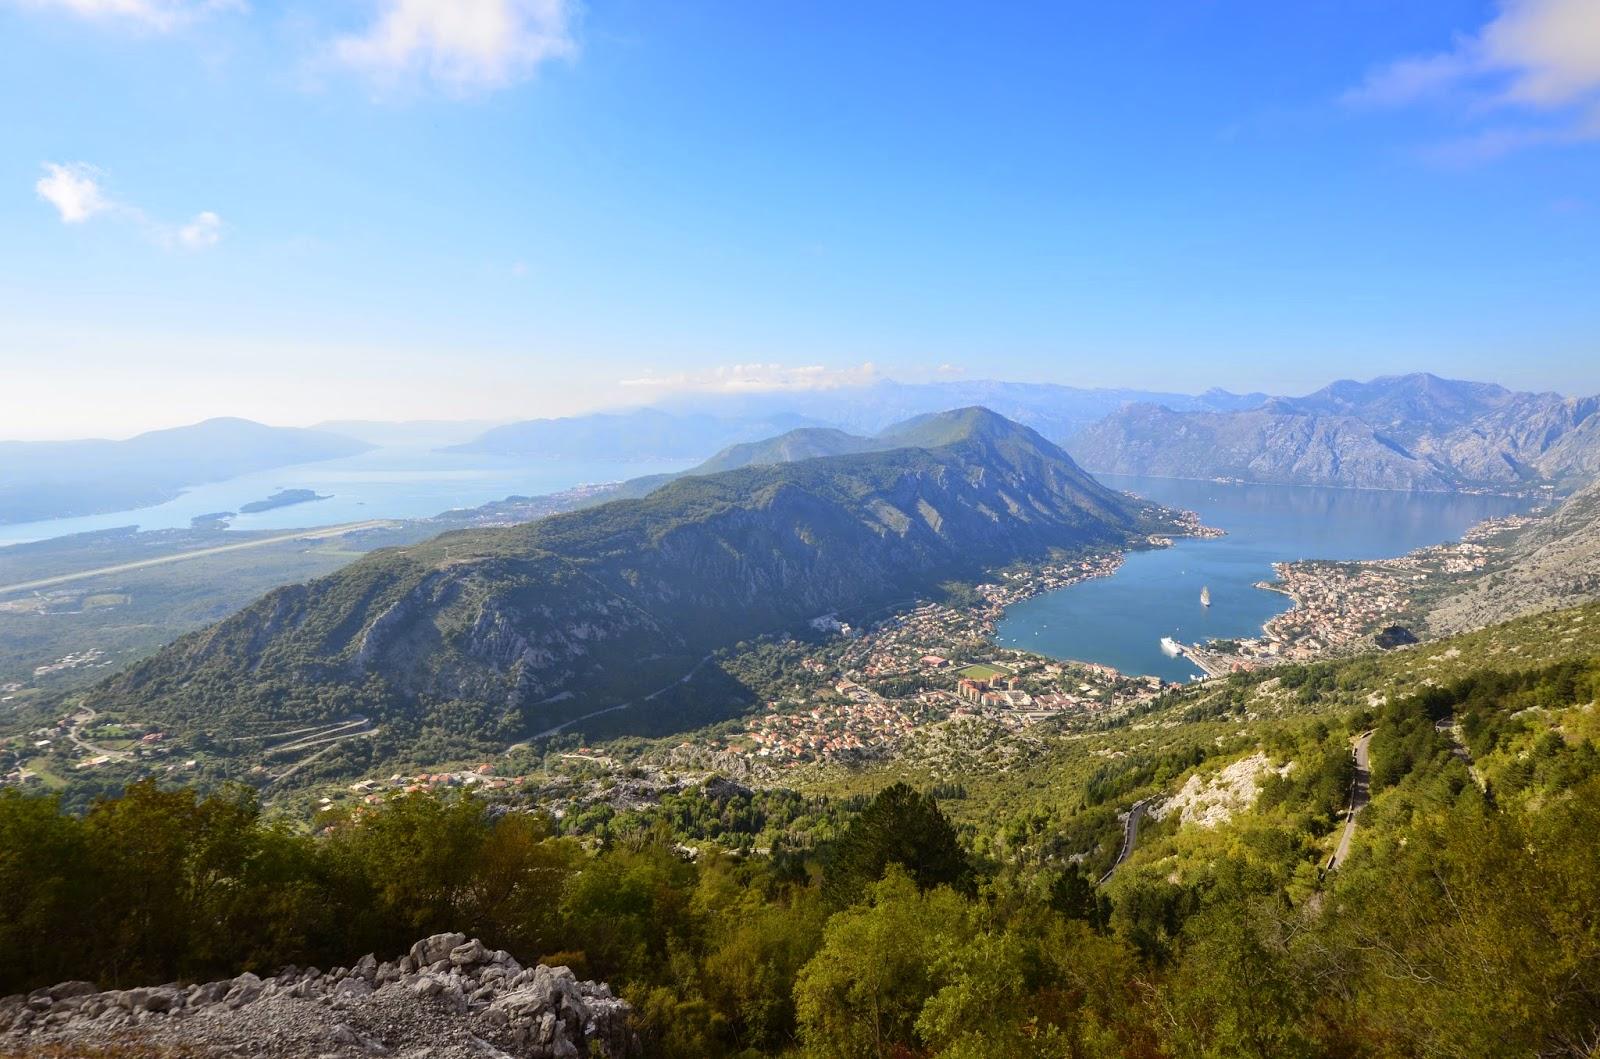 Monténégro, Bouches du Kotor, Serpentine, Ostrog, Skadar, Canoe, Sveti Stefan, Perast, Njegos, Podgorica, Budva, Cetinje